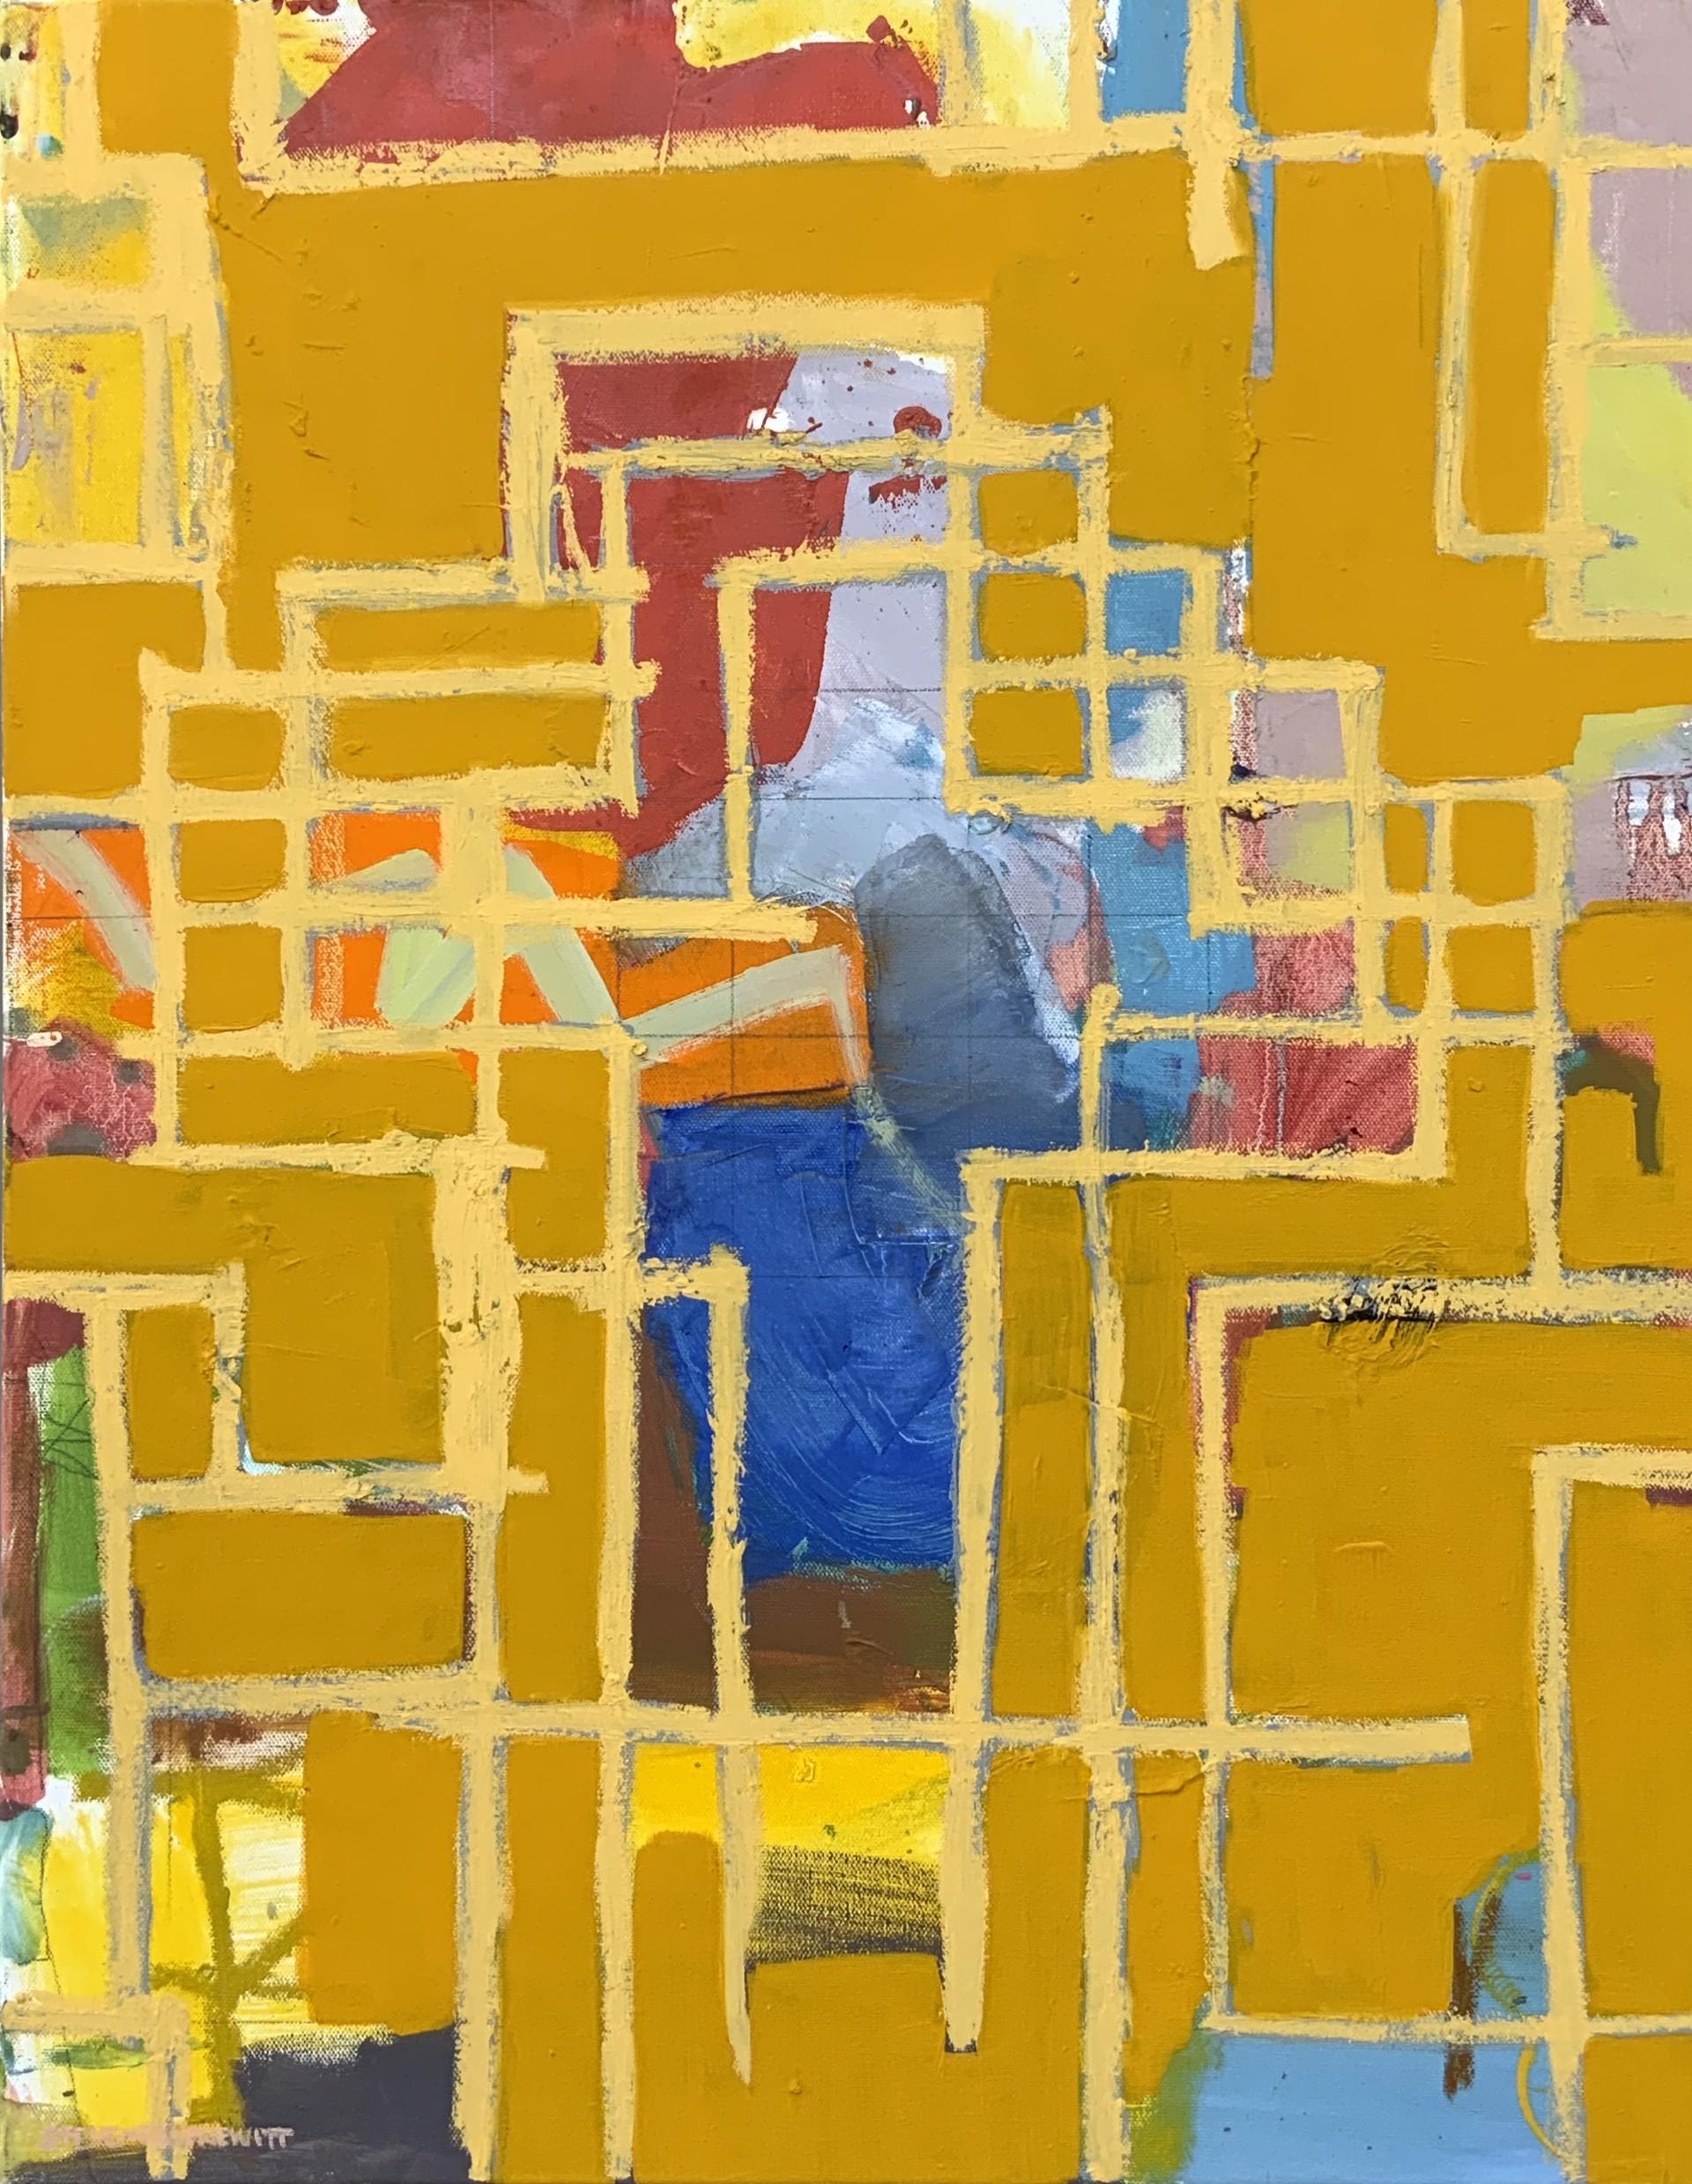 3 Crosses w/in Naples Yellow by Steven Page Prewitt